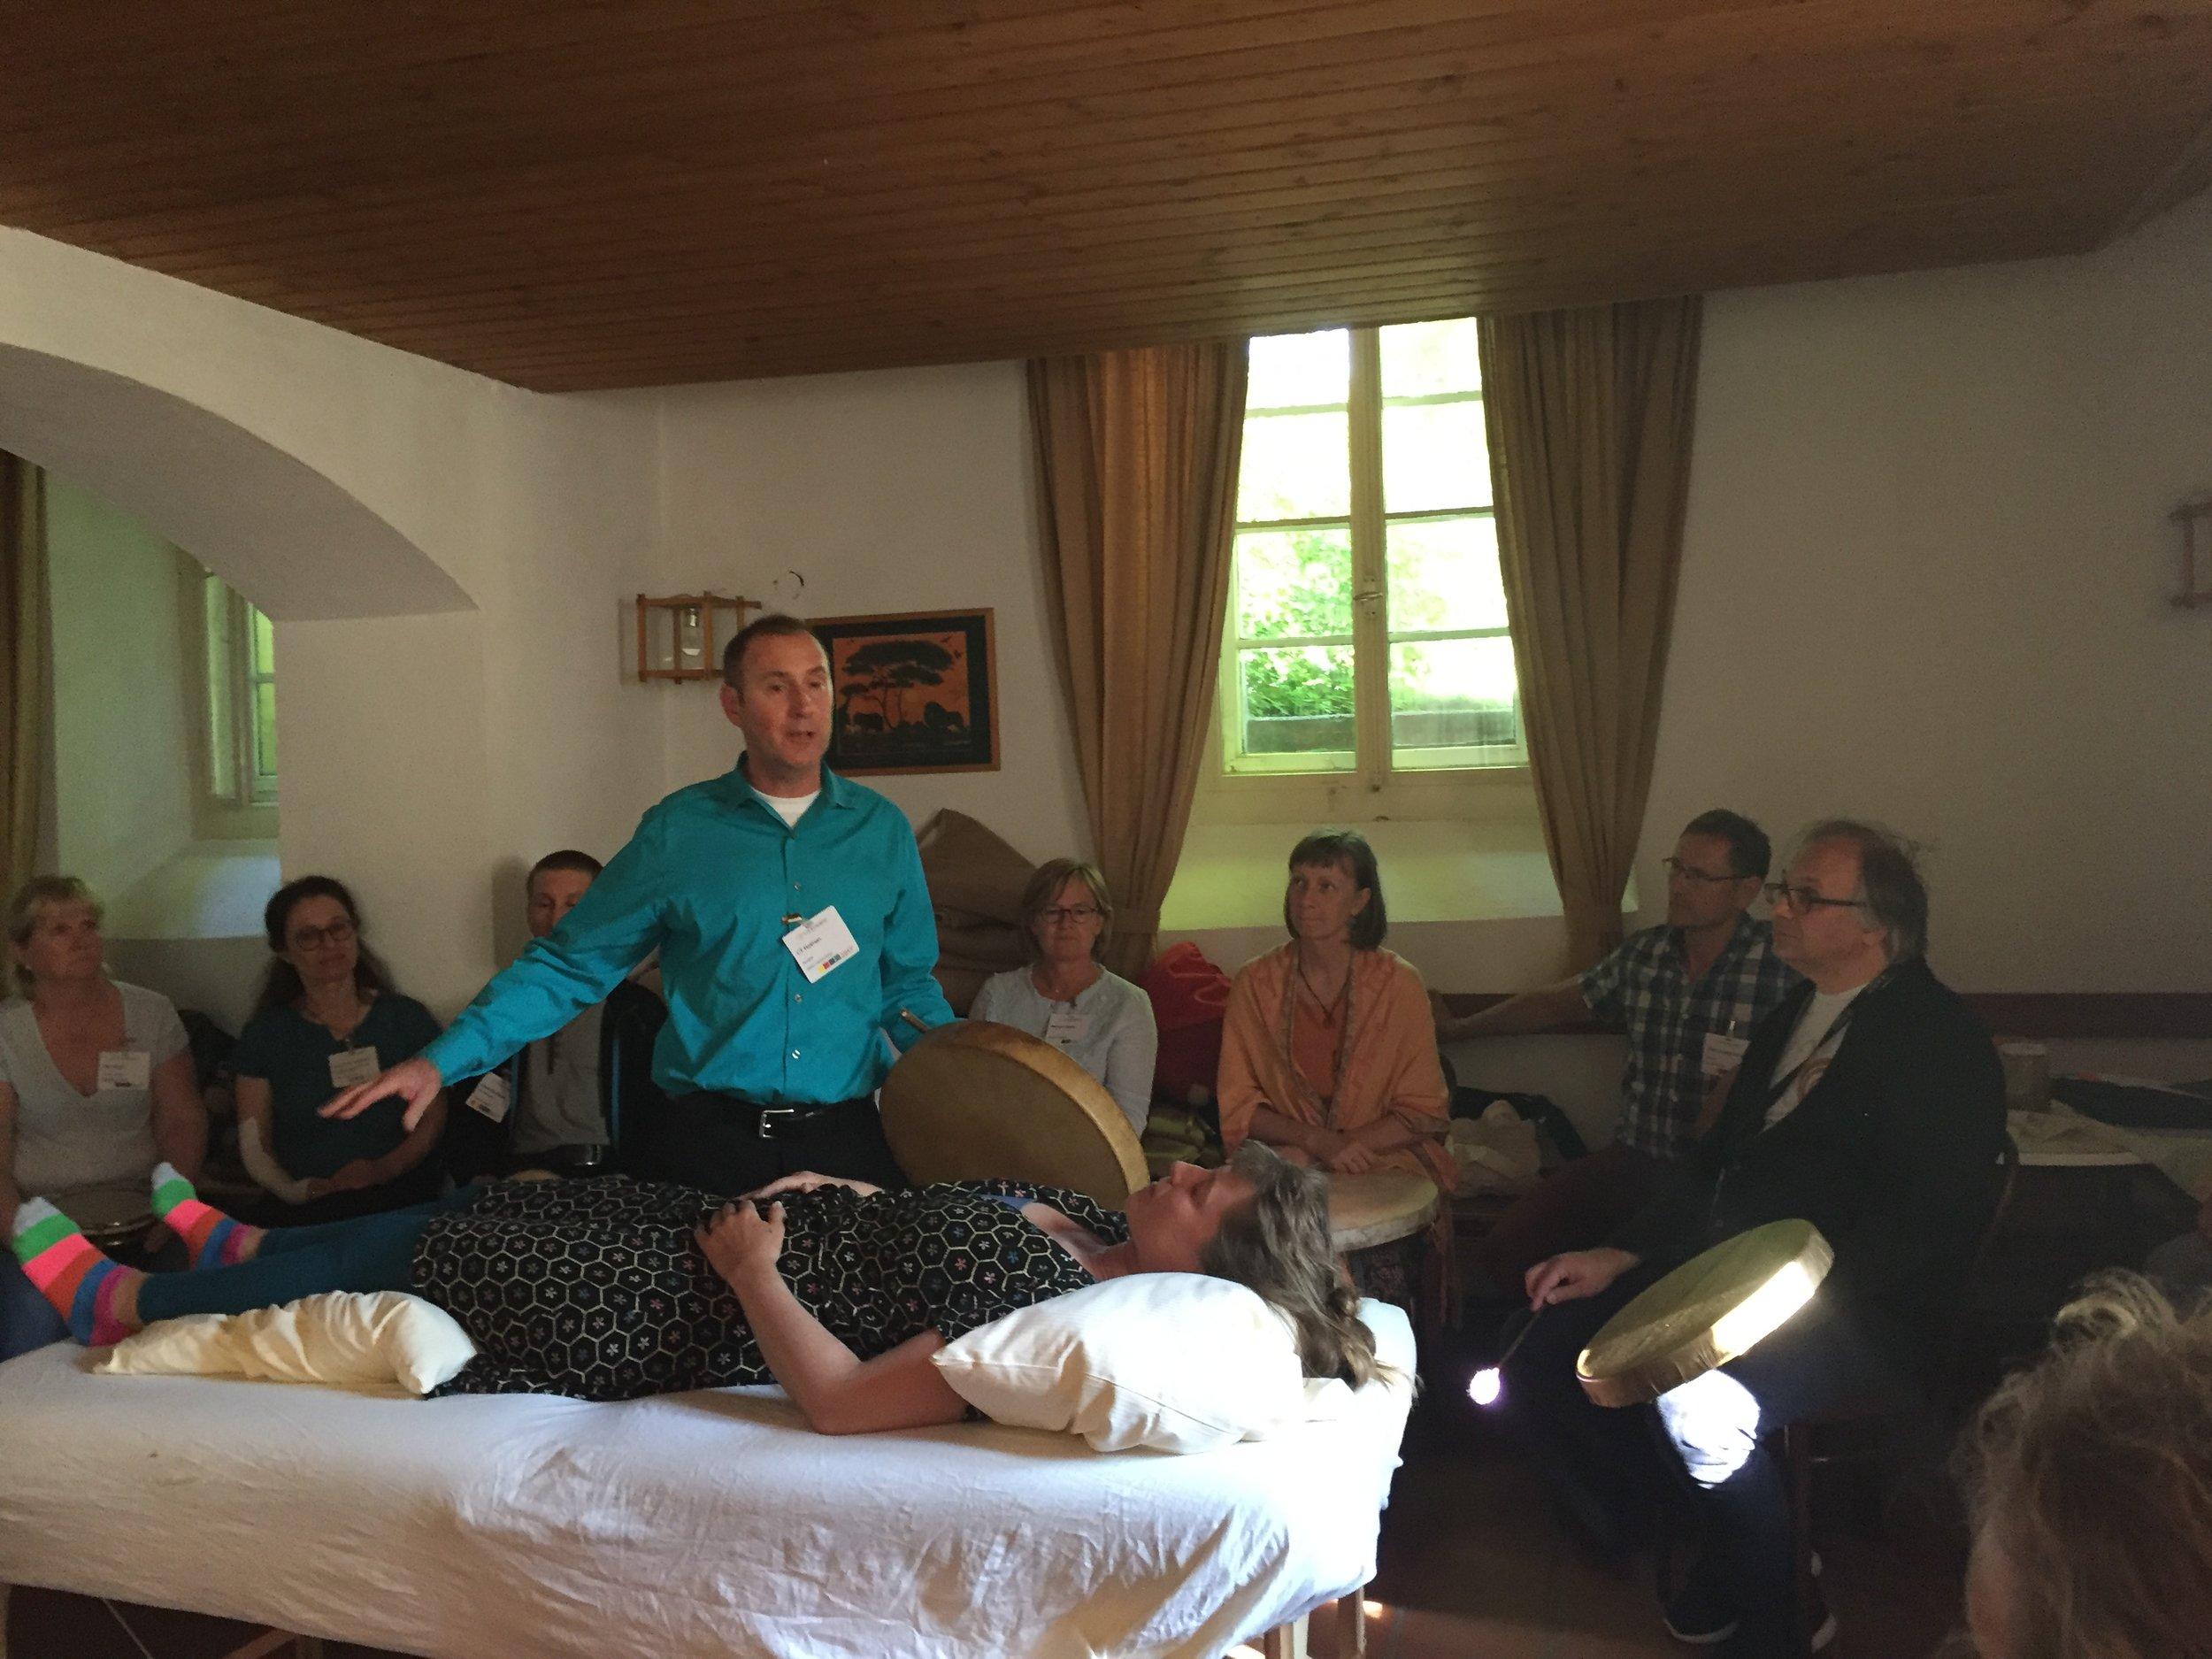 Teaching Chinese medicine drum healing at the 2017 TCM Kongress in Rothenburg, Germany.